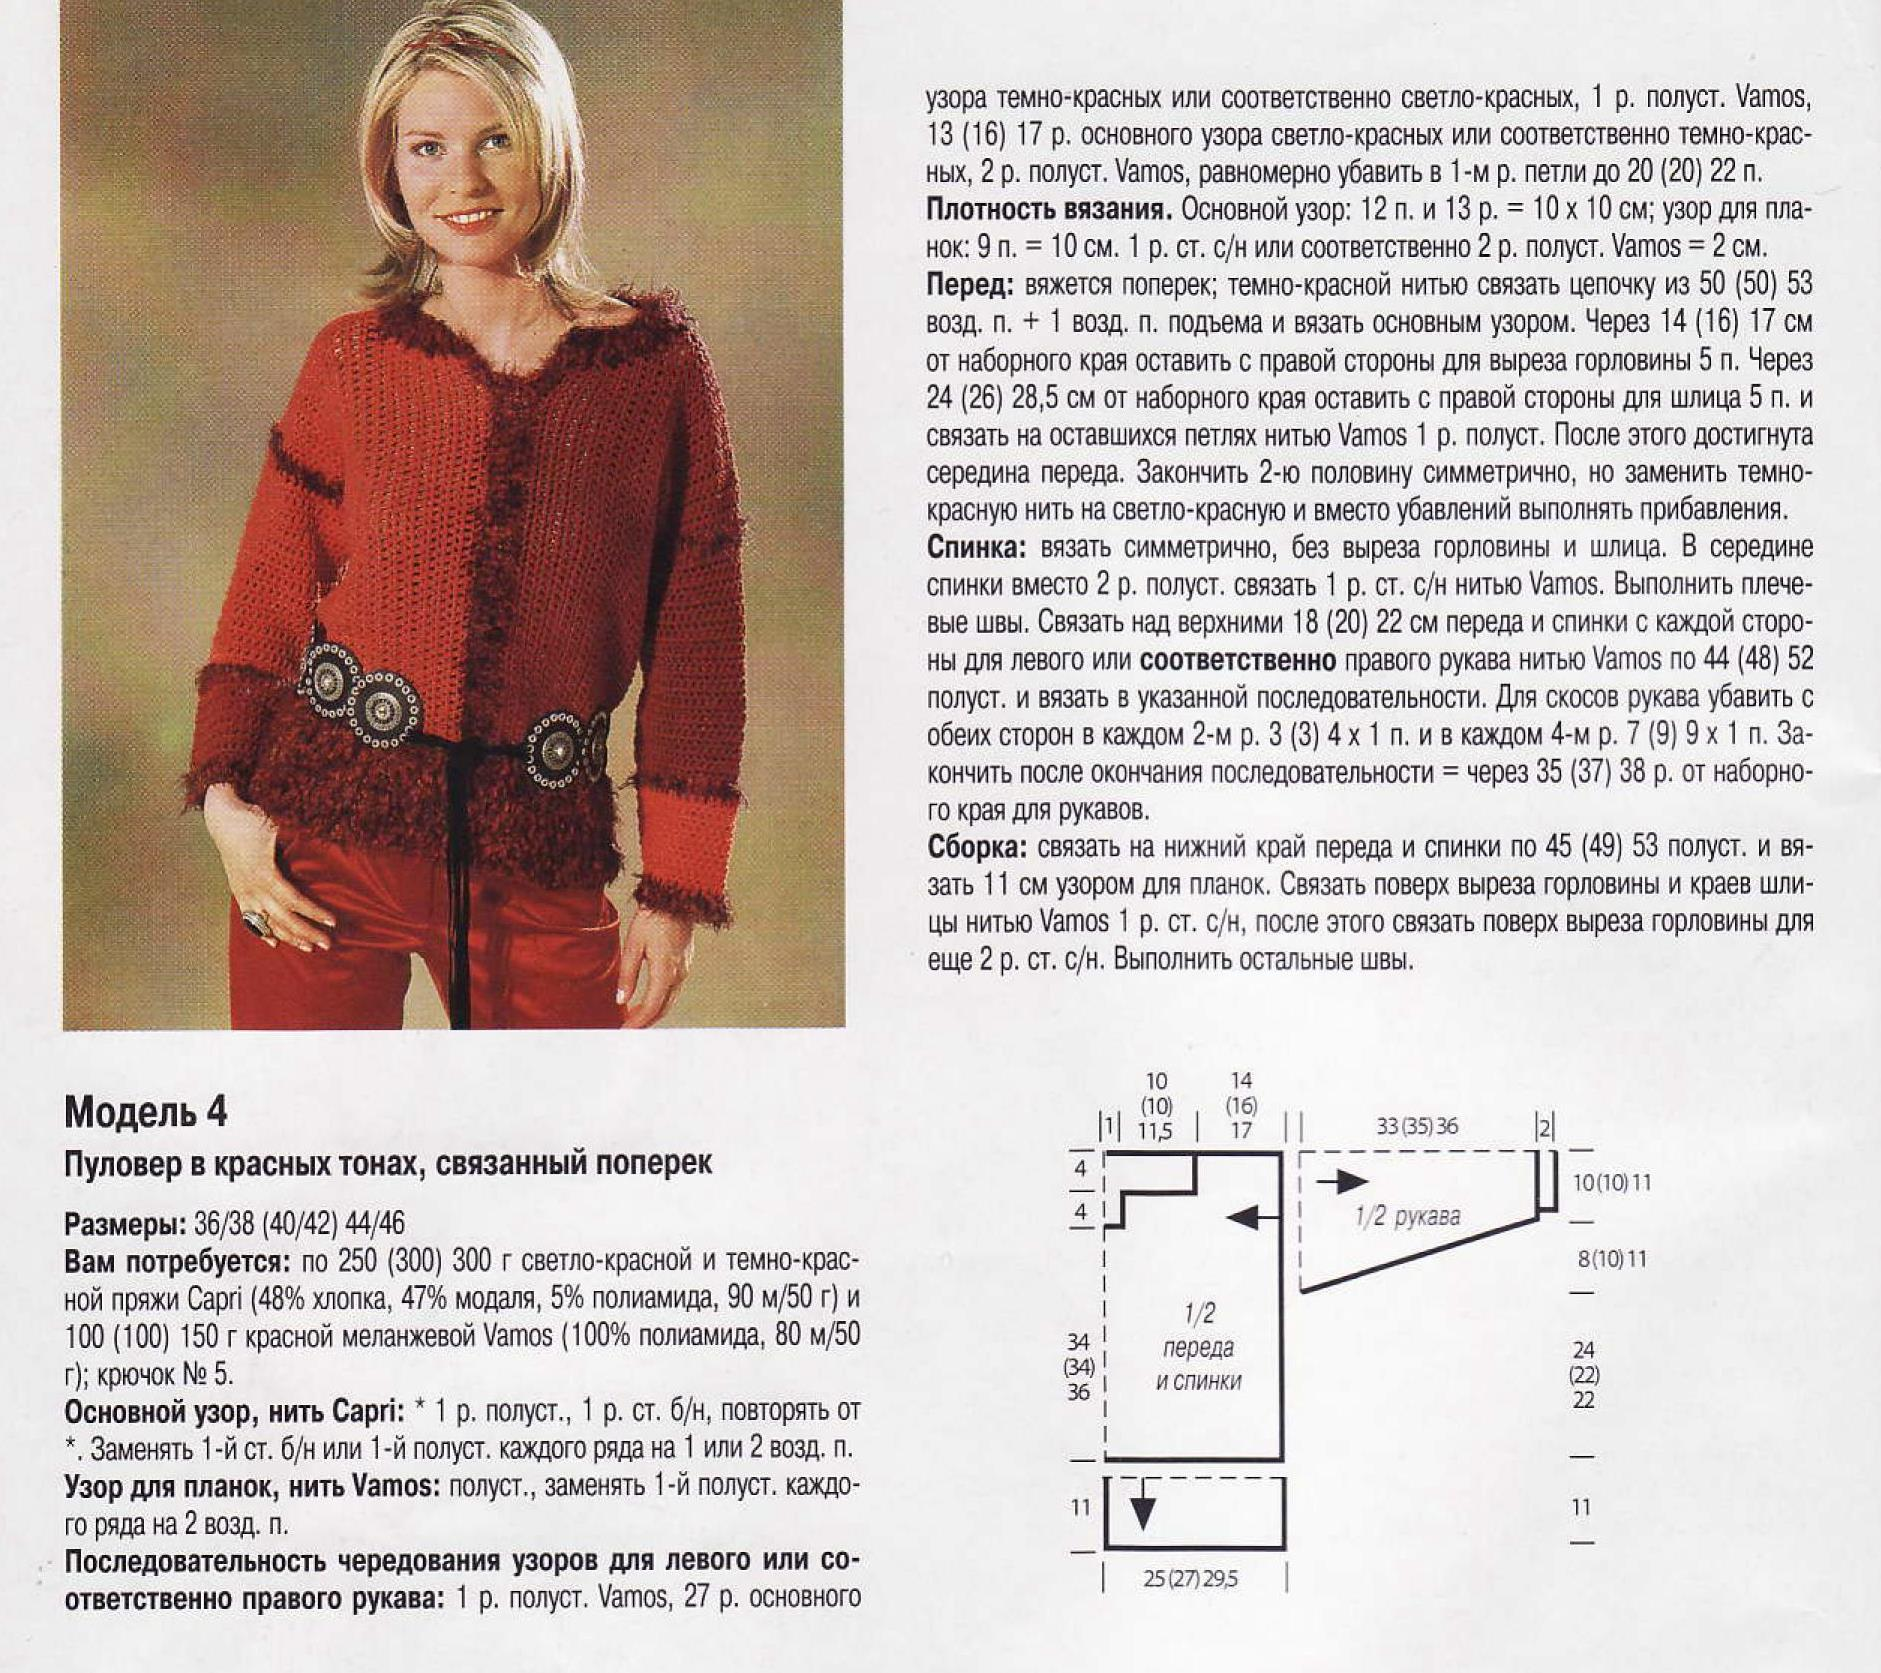 1802_MD_9_2003 (9)